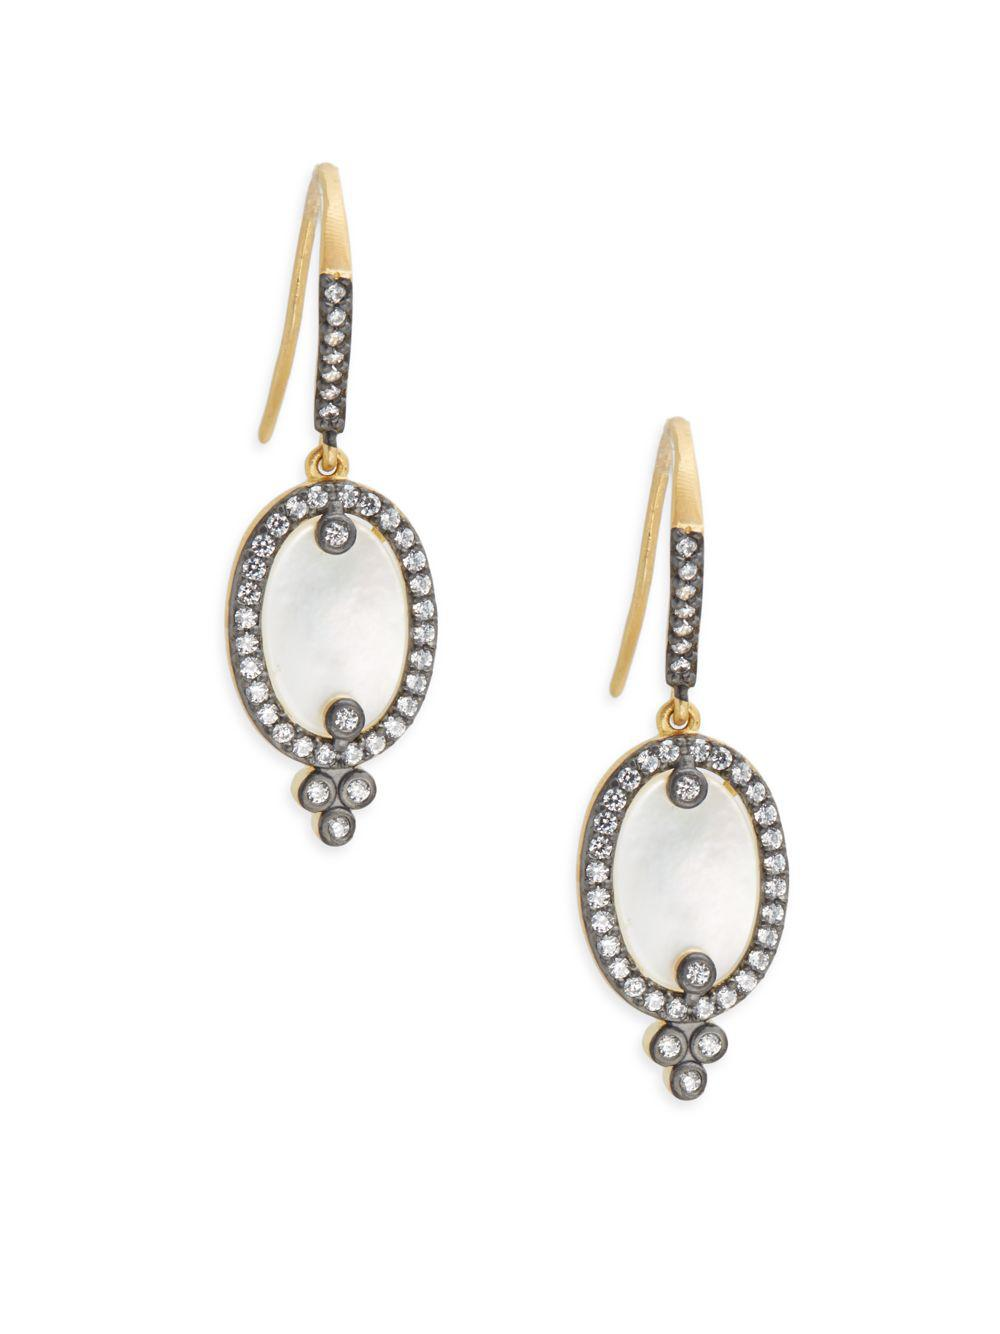 Freida Rothman Two Tone Pave Slice Drop Earrings 17Js6Cp6